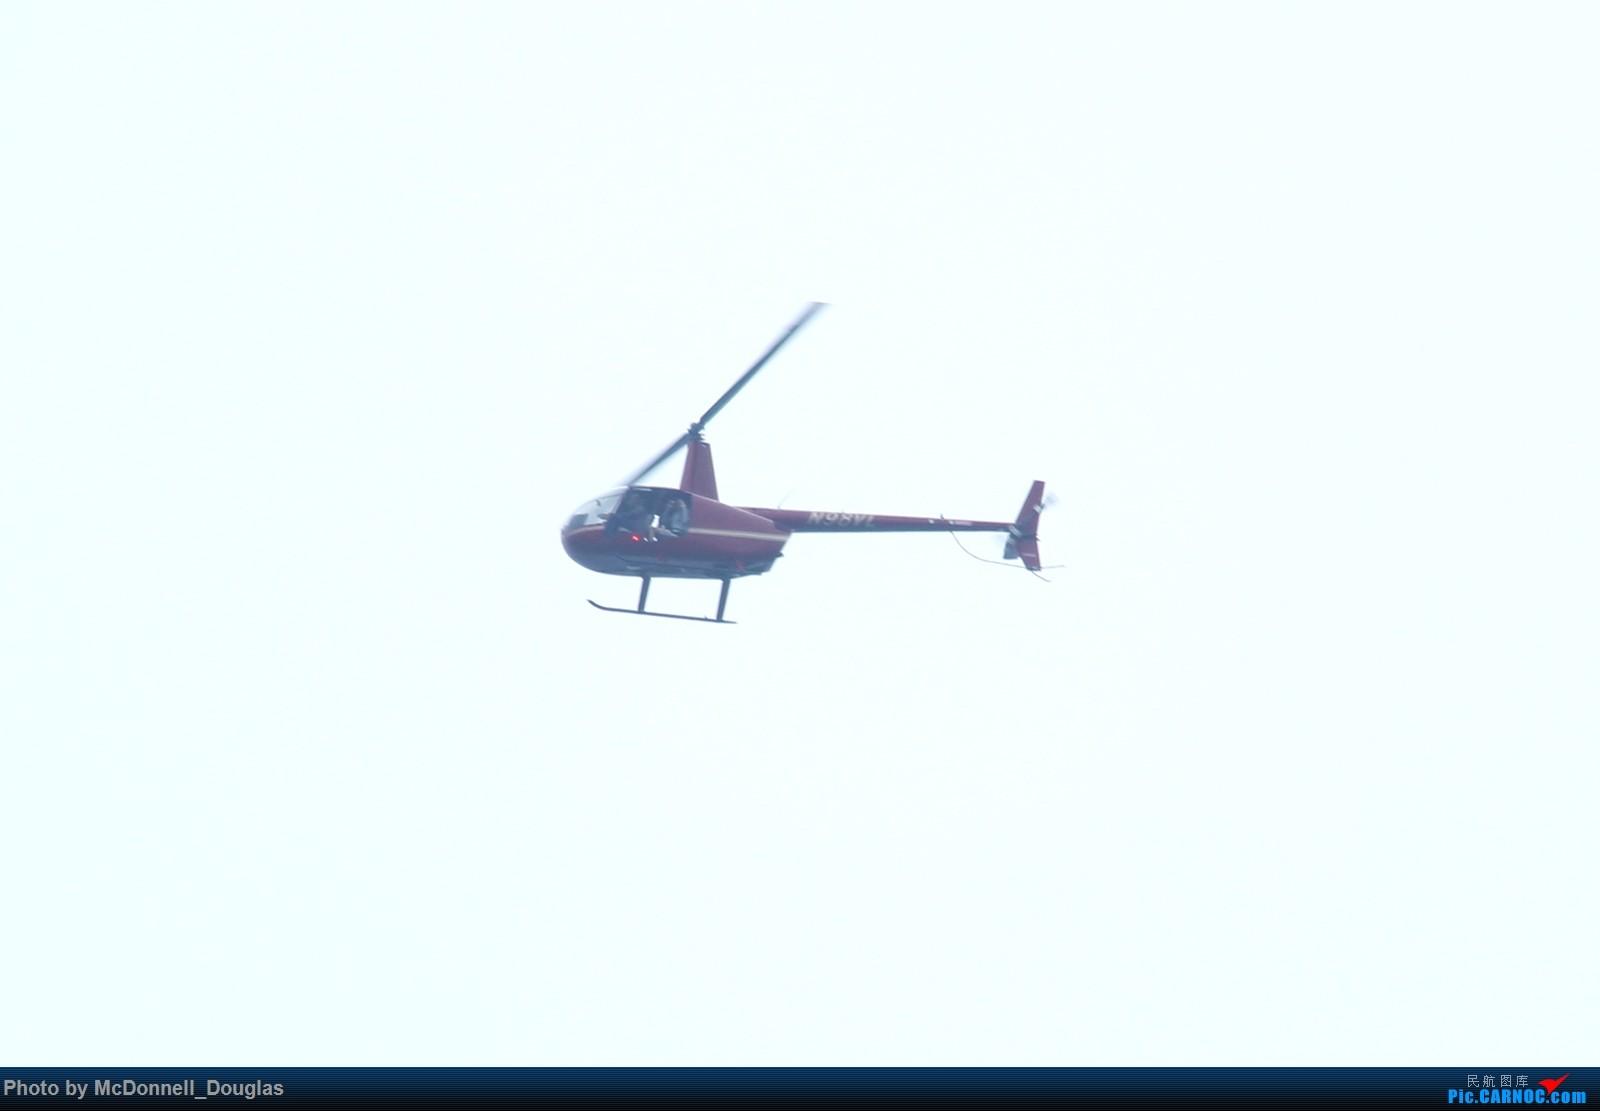 Re:[原创]【上海飞友会】图会很多,也有很多驾驶舱,杂七杂八的美帝,梦寐以求的圣马丁,这更绝不弃贴【驾驶舱已出现】 ROBINSON R-44 N98VL Offport